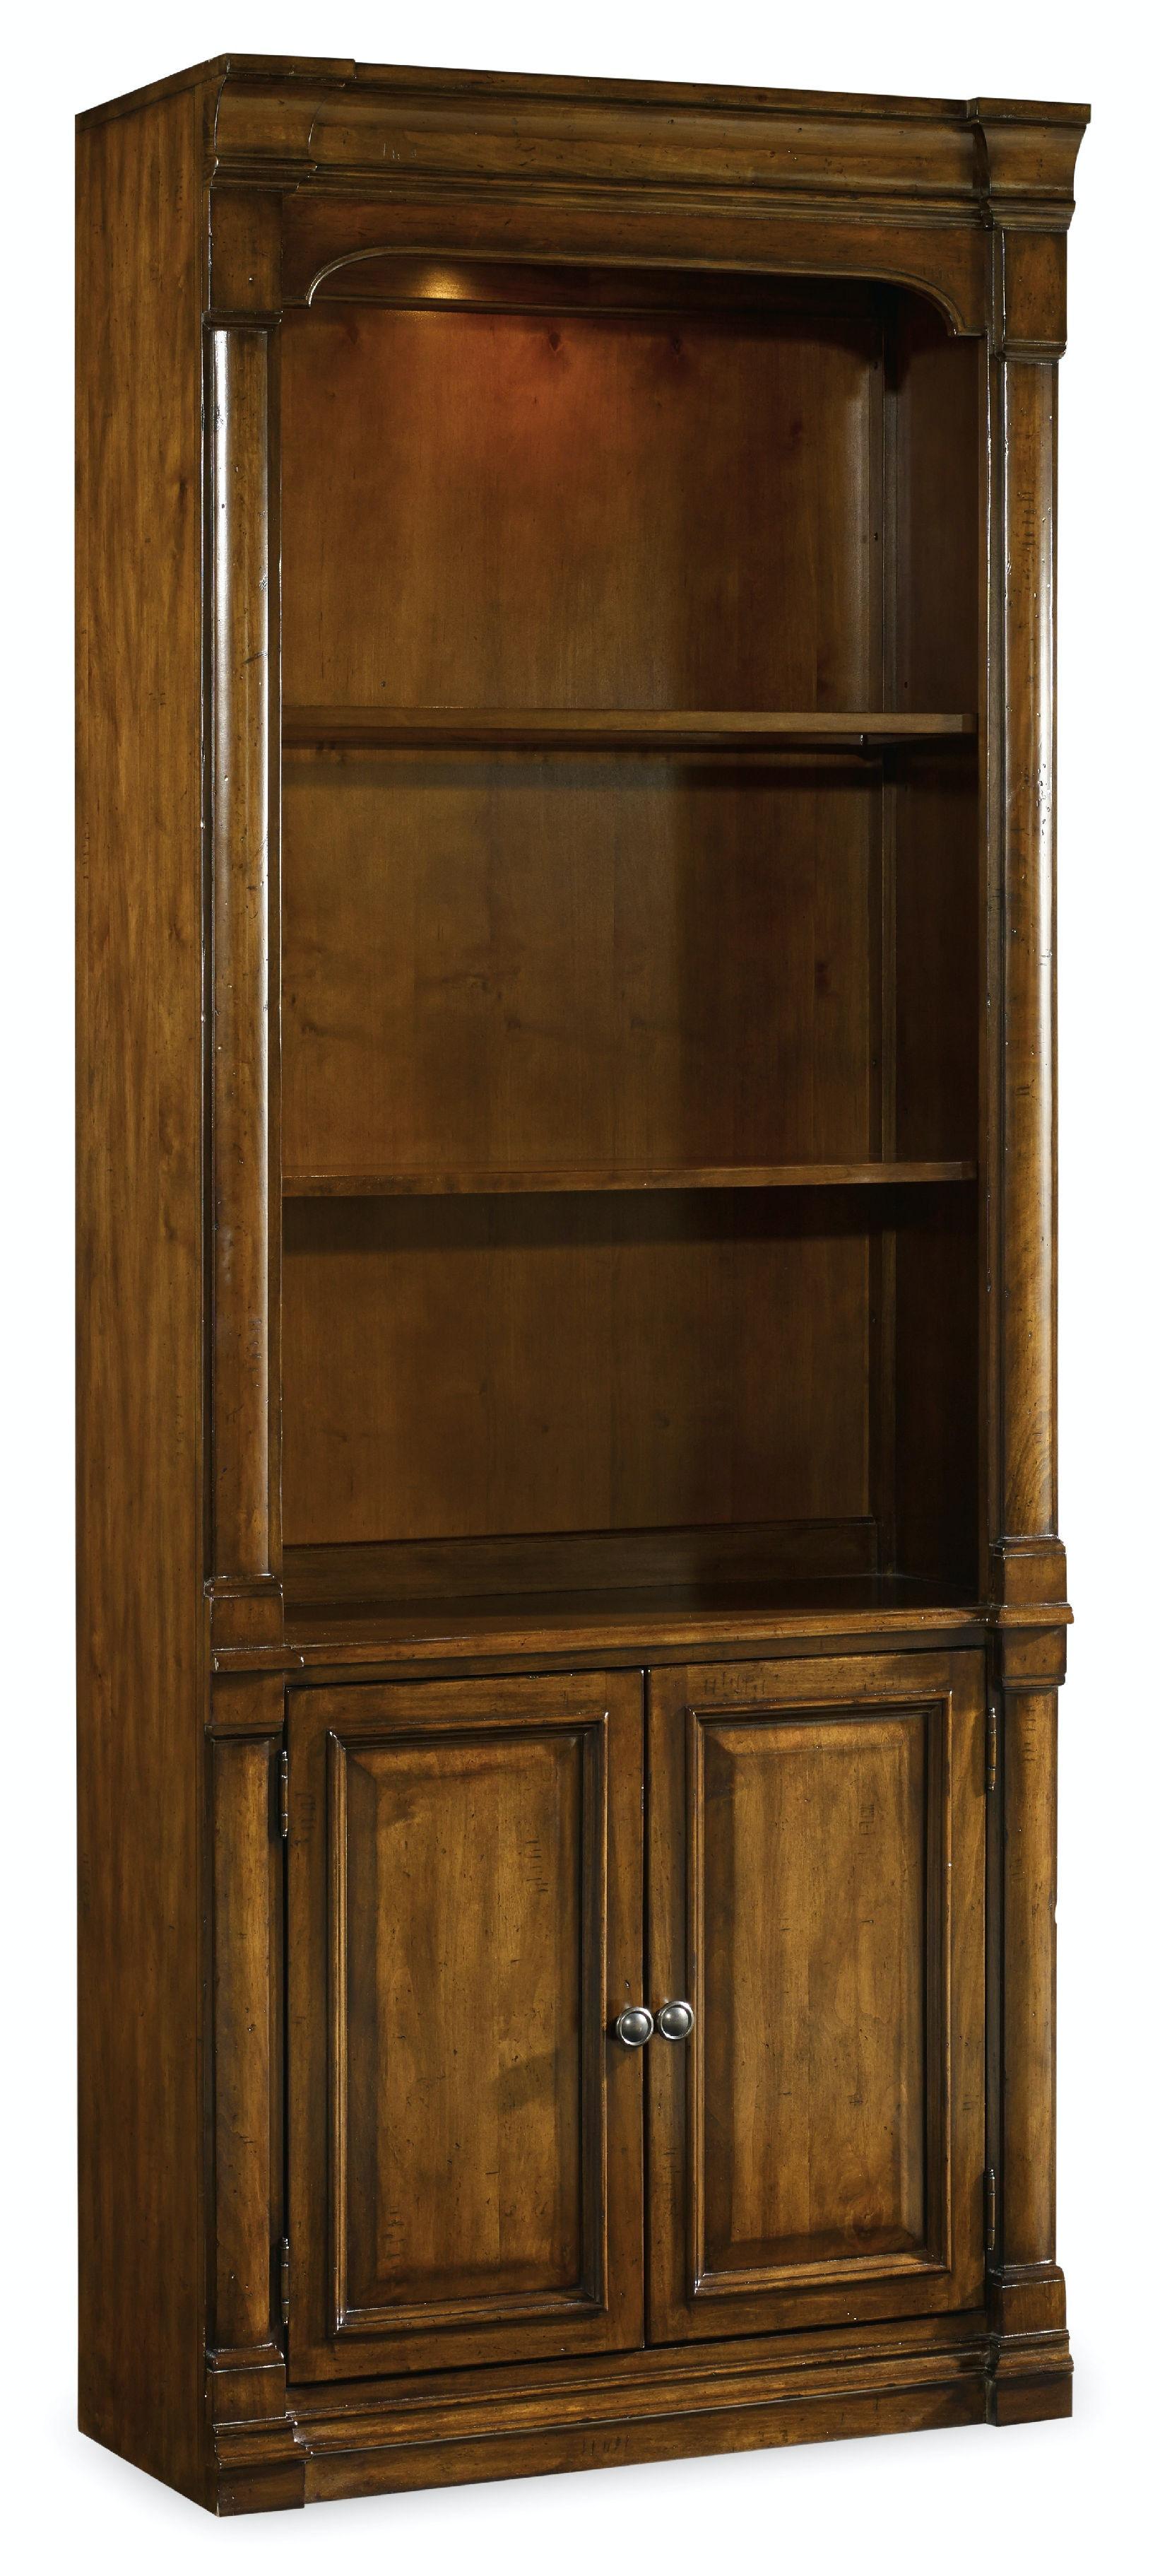 Tynecastle Bunching Bookcase 5323-10446